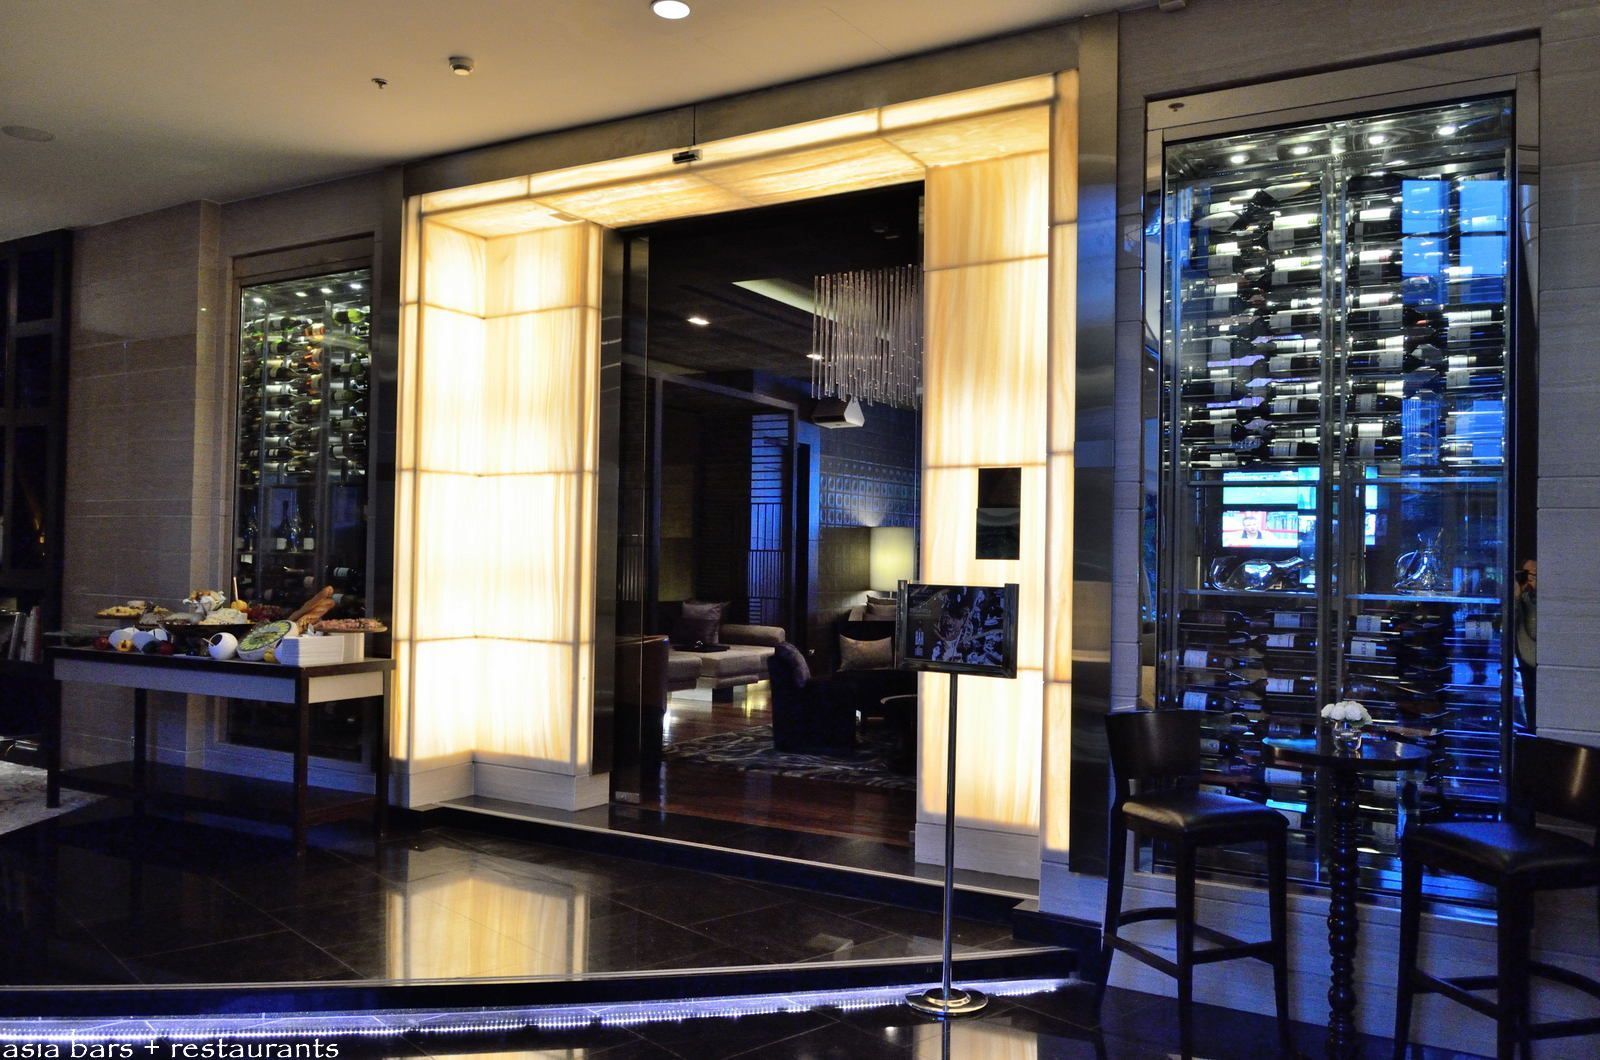 sports lounge interior design - Google Search | Restaurants, Bars ...